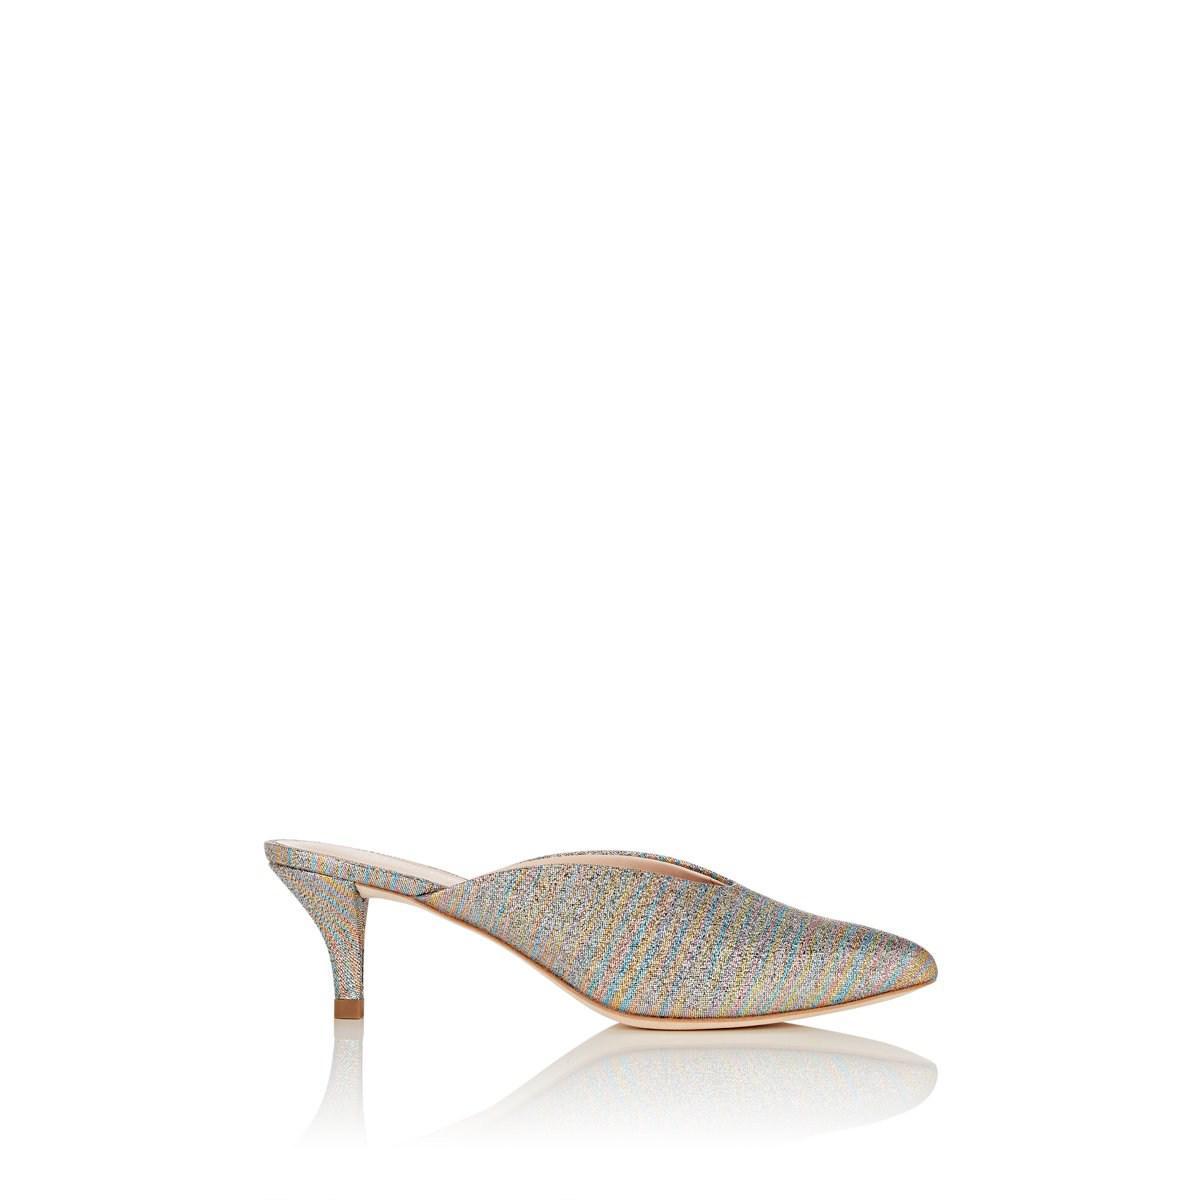 d98e8b76c6 Loeffler Randall Juno Glitter Striped Mule - Save 62% - Lyst